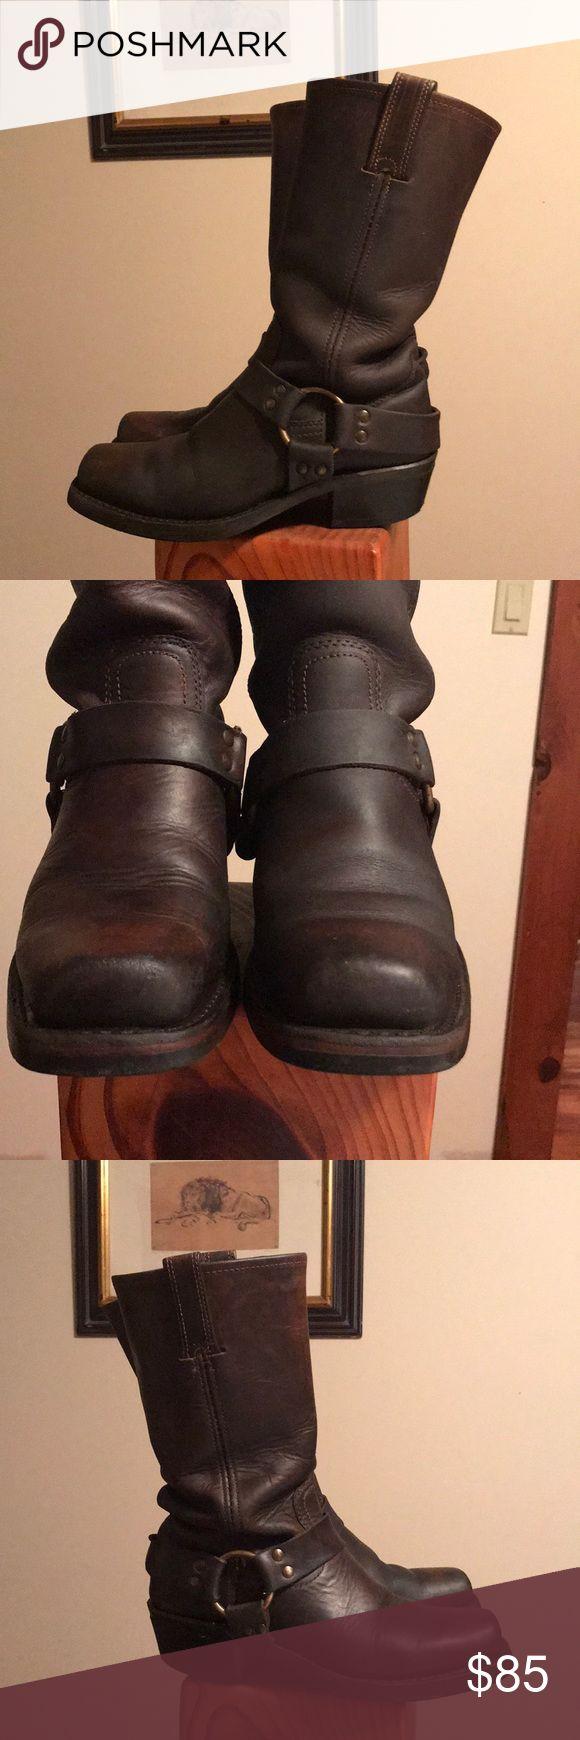 Frye dk brown brass harness boots vintage 7 ladies